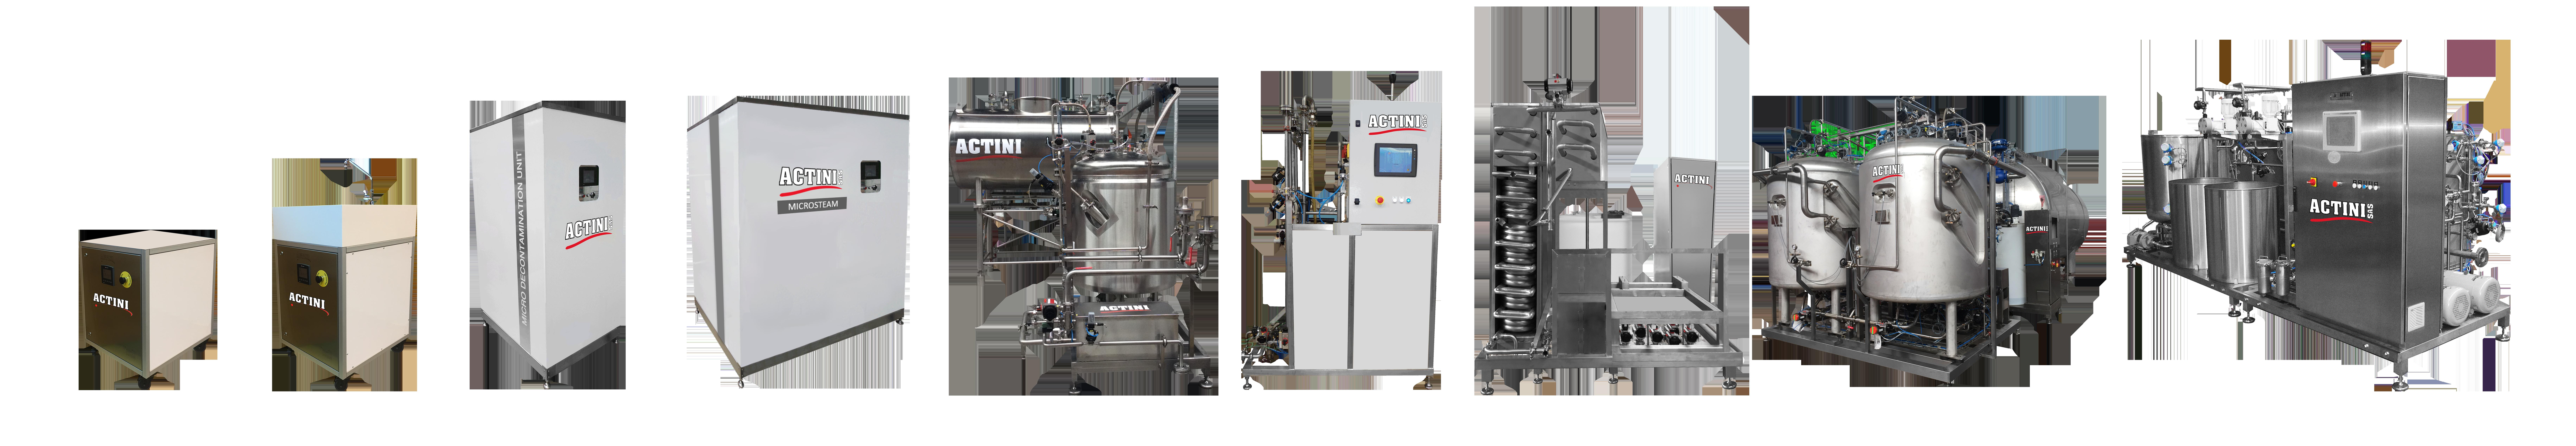 ACTINI - Biopharma - complete range